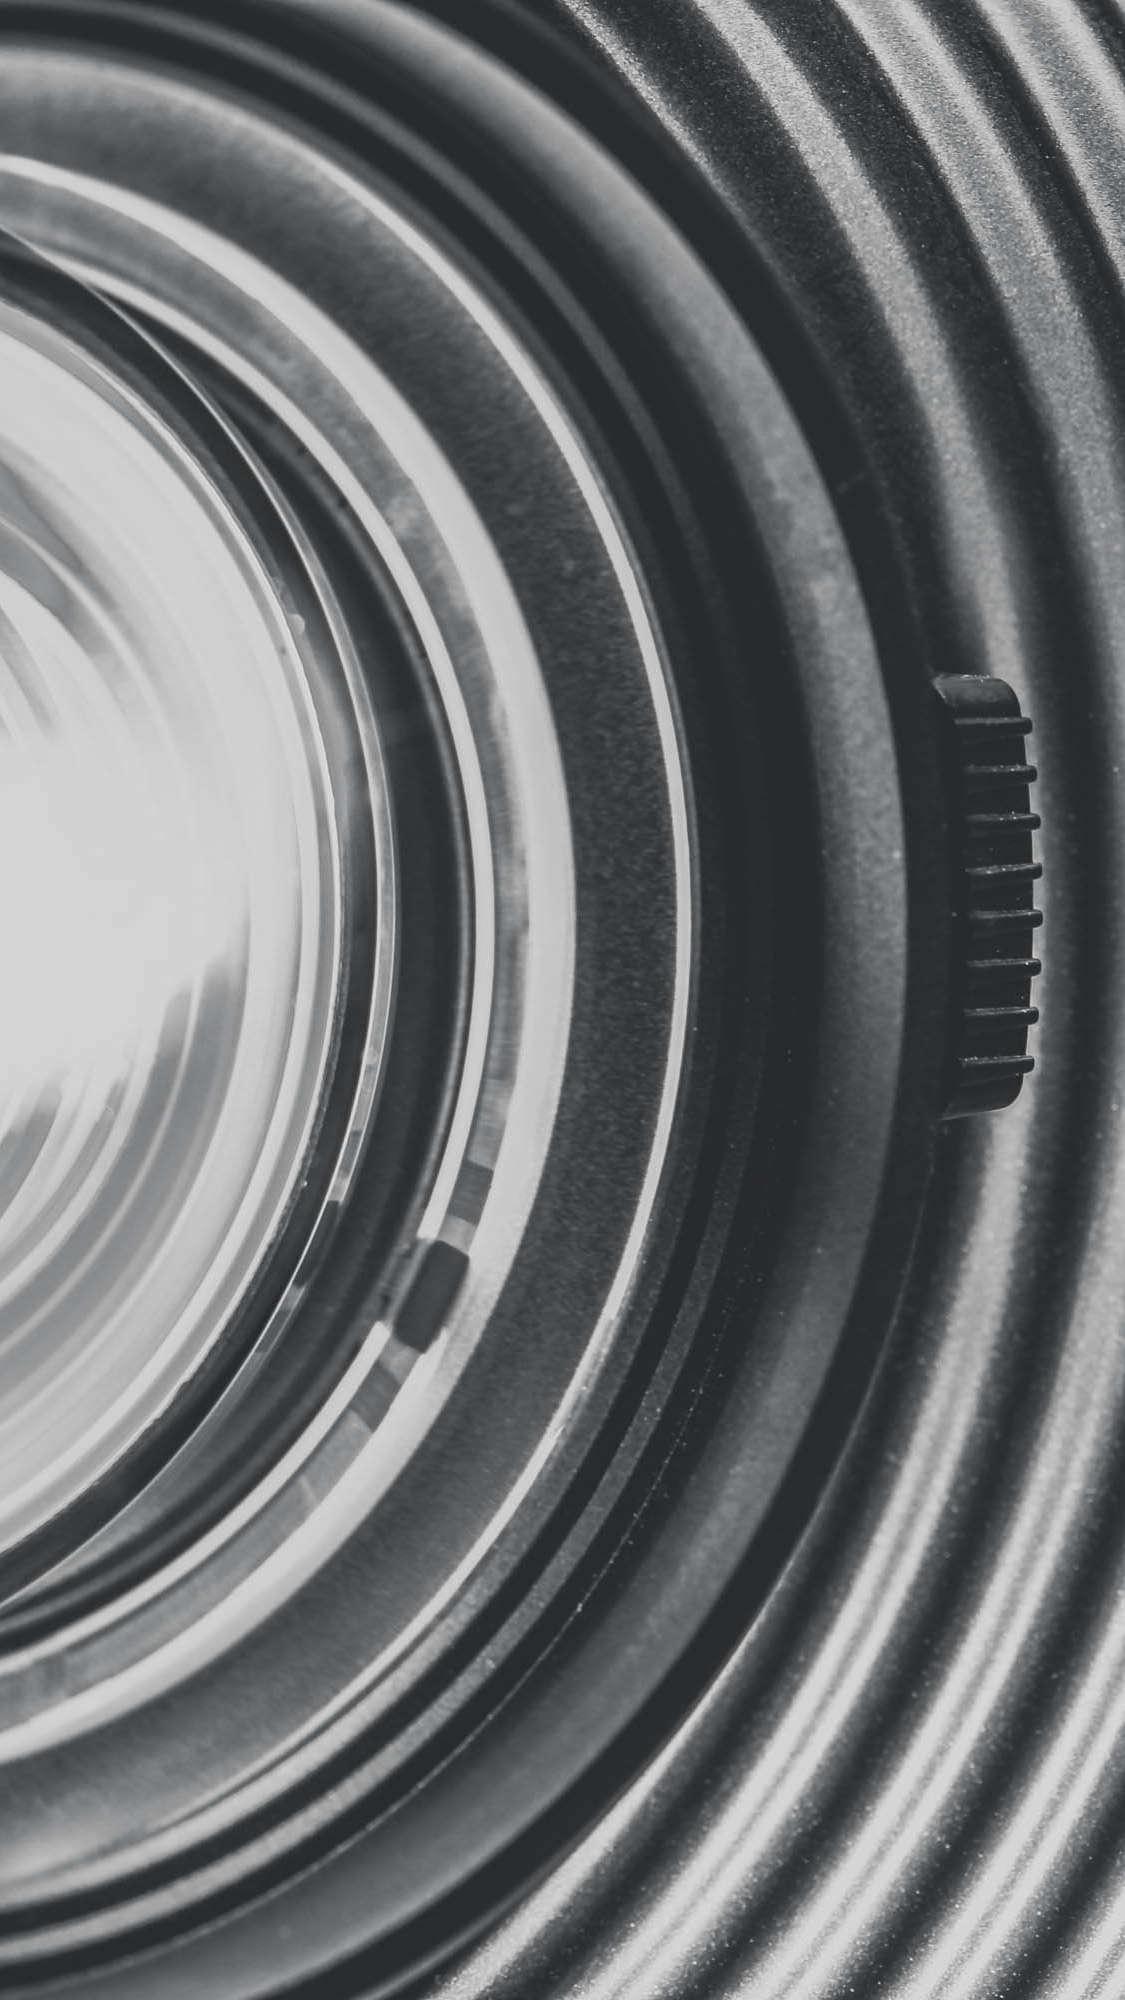 Klangfein | Beamer | Projektor | Leinwand | LCD | LED | Tagung | Kongress | Präsentation | Veranstaltungstechnik | Mieten | Buchen | Anfragen | Hannover